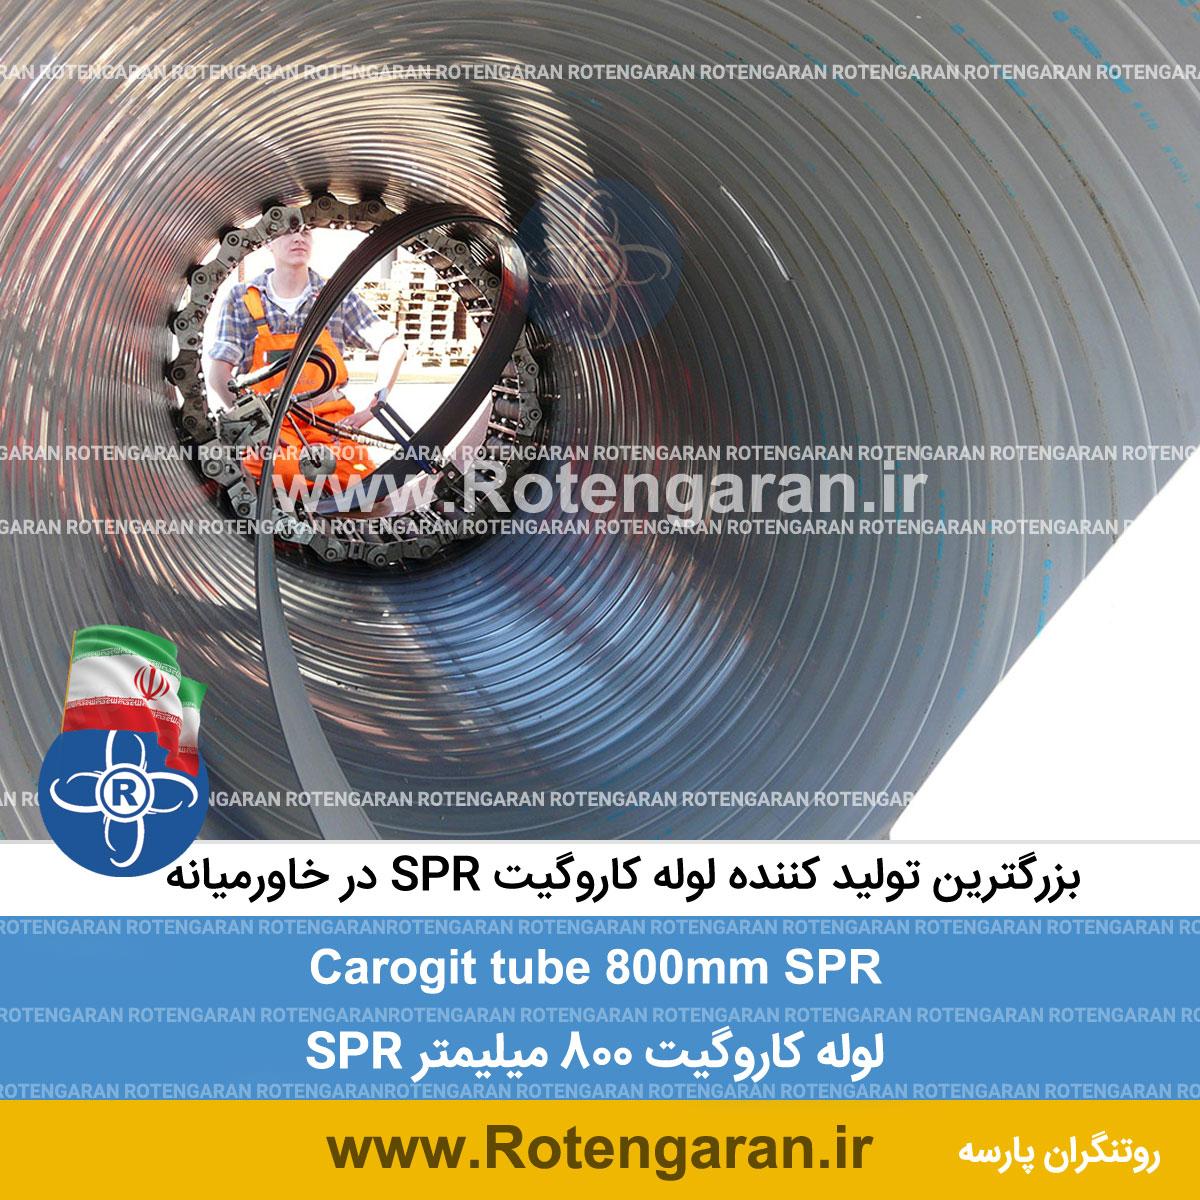 لوله کاروگیت SPR